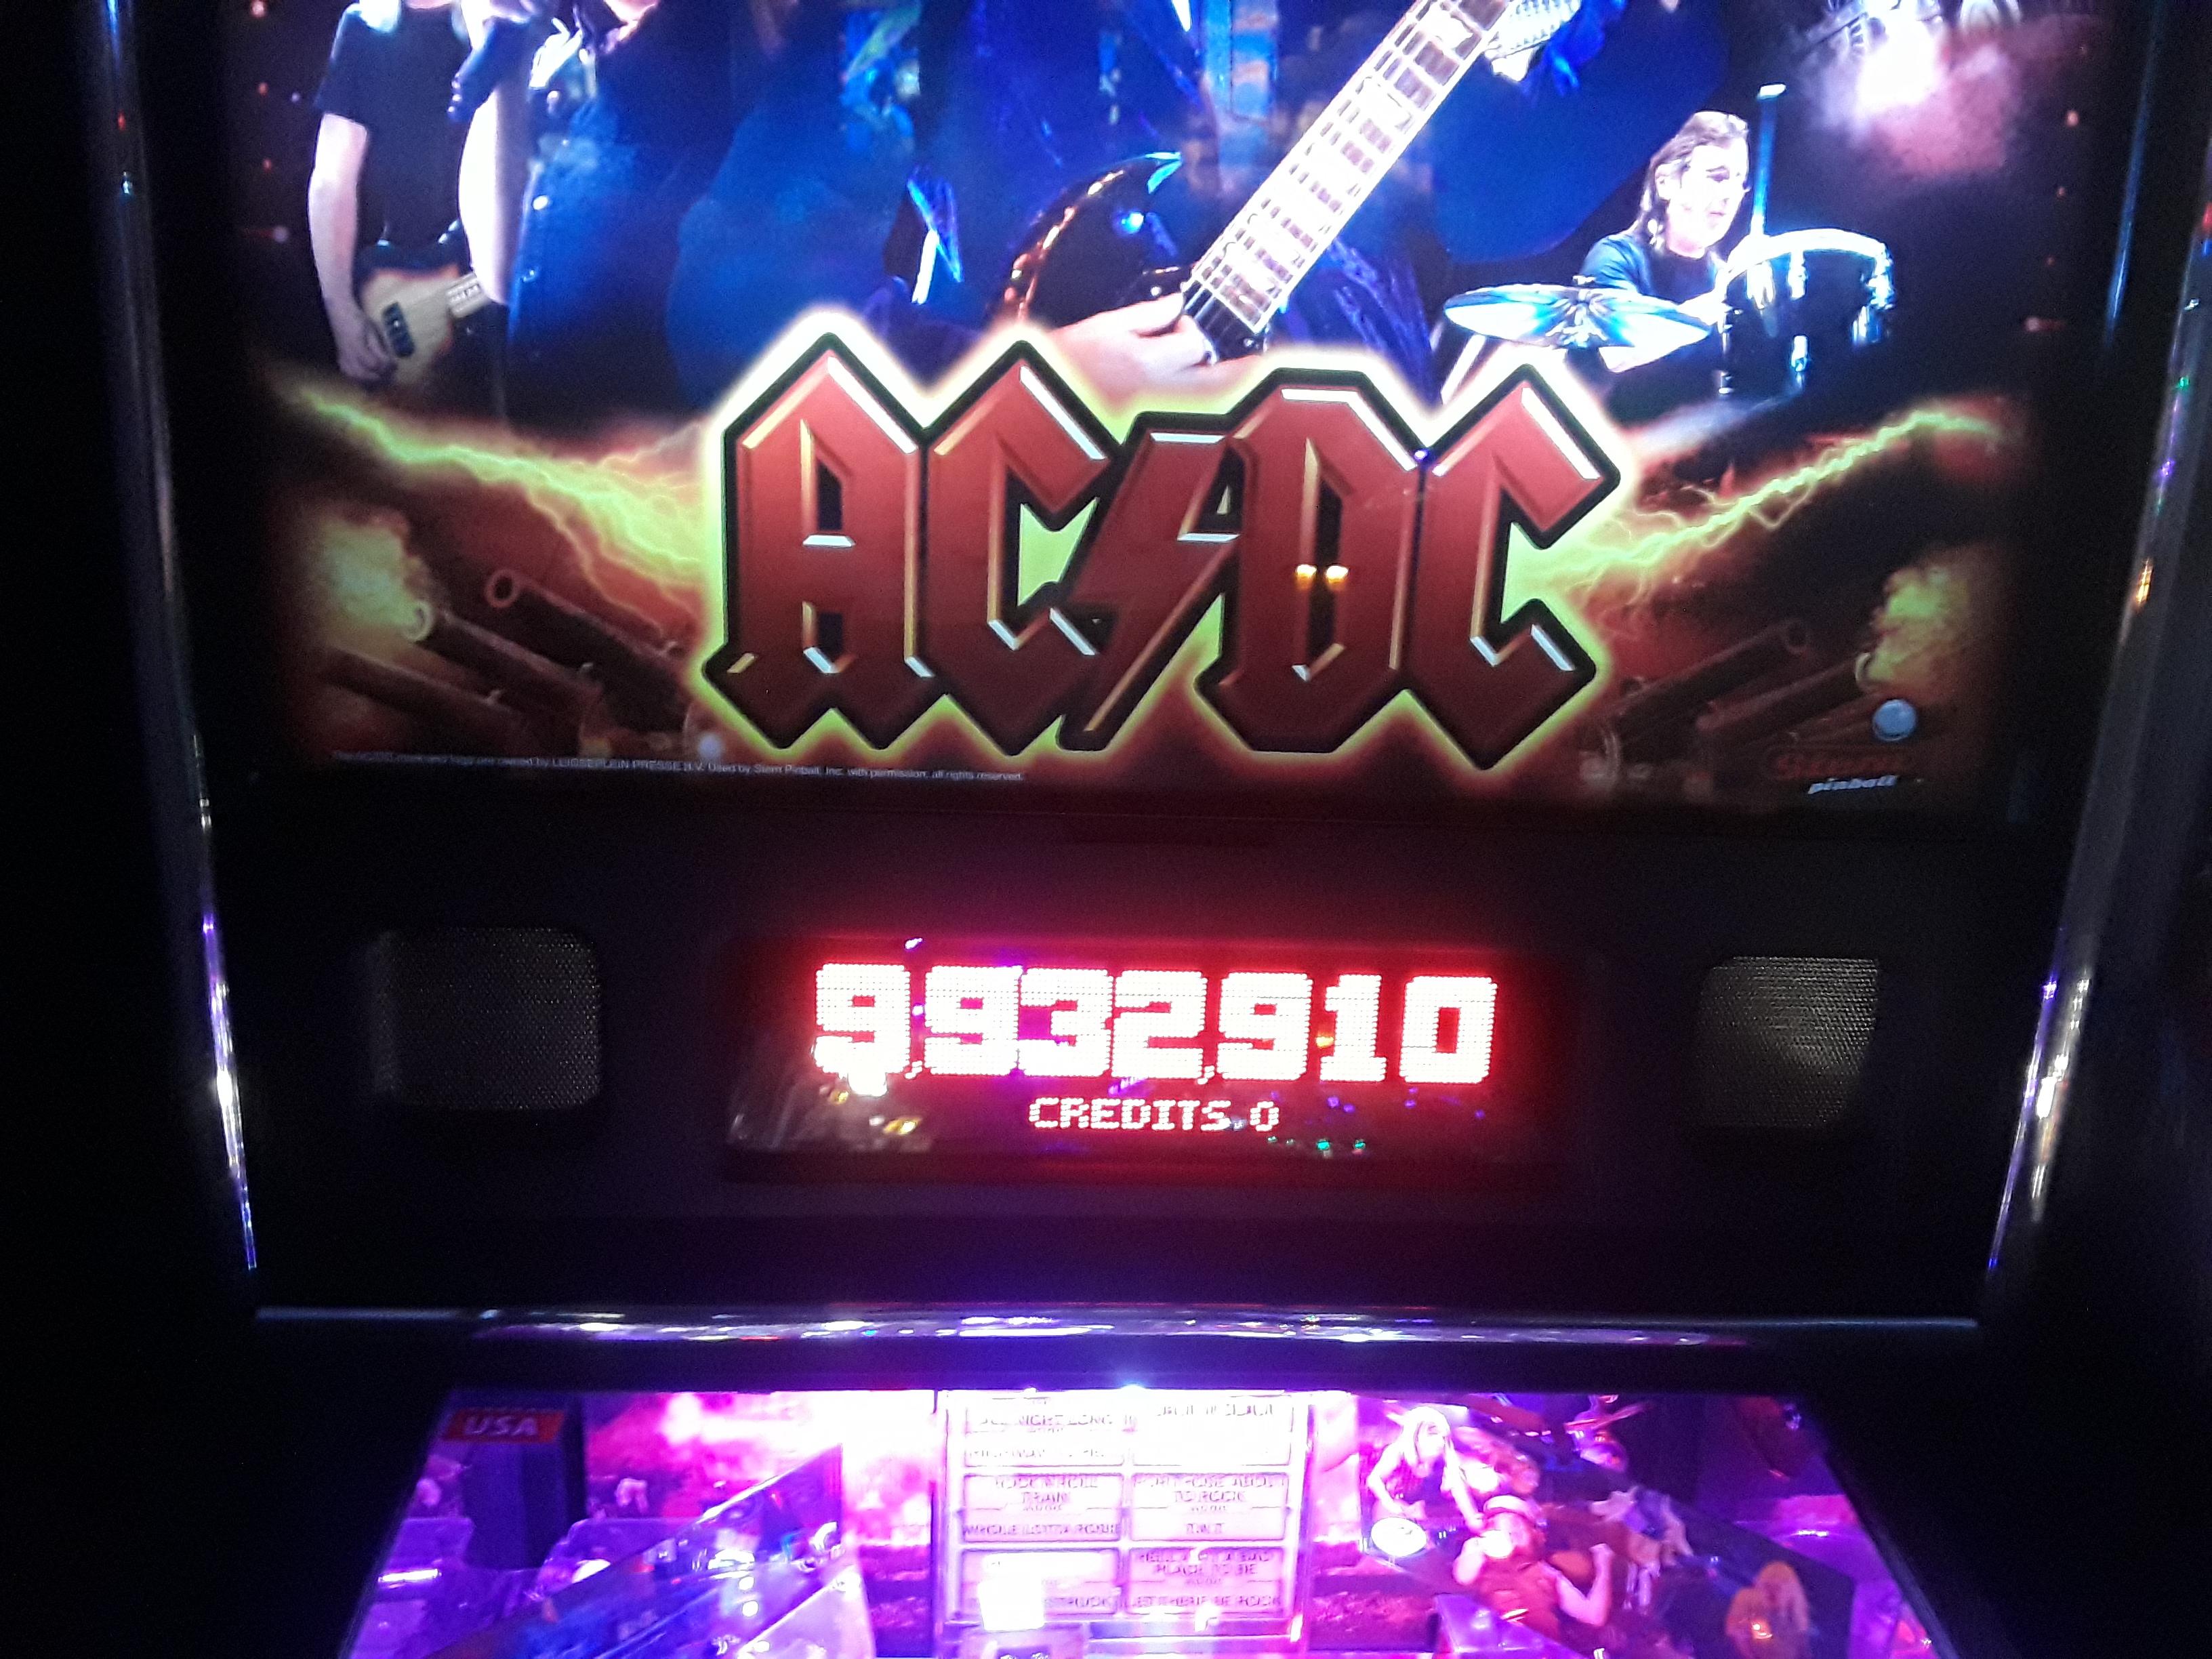 JML101582: AC/DC (Pinball: 3 Balls) 9,932,910 points on 2019-02-16 04:19:24